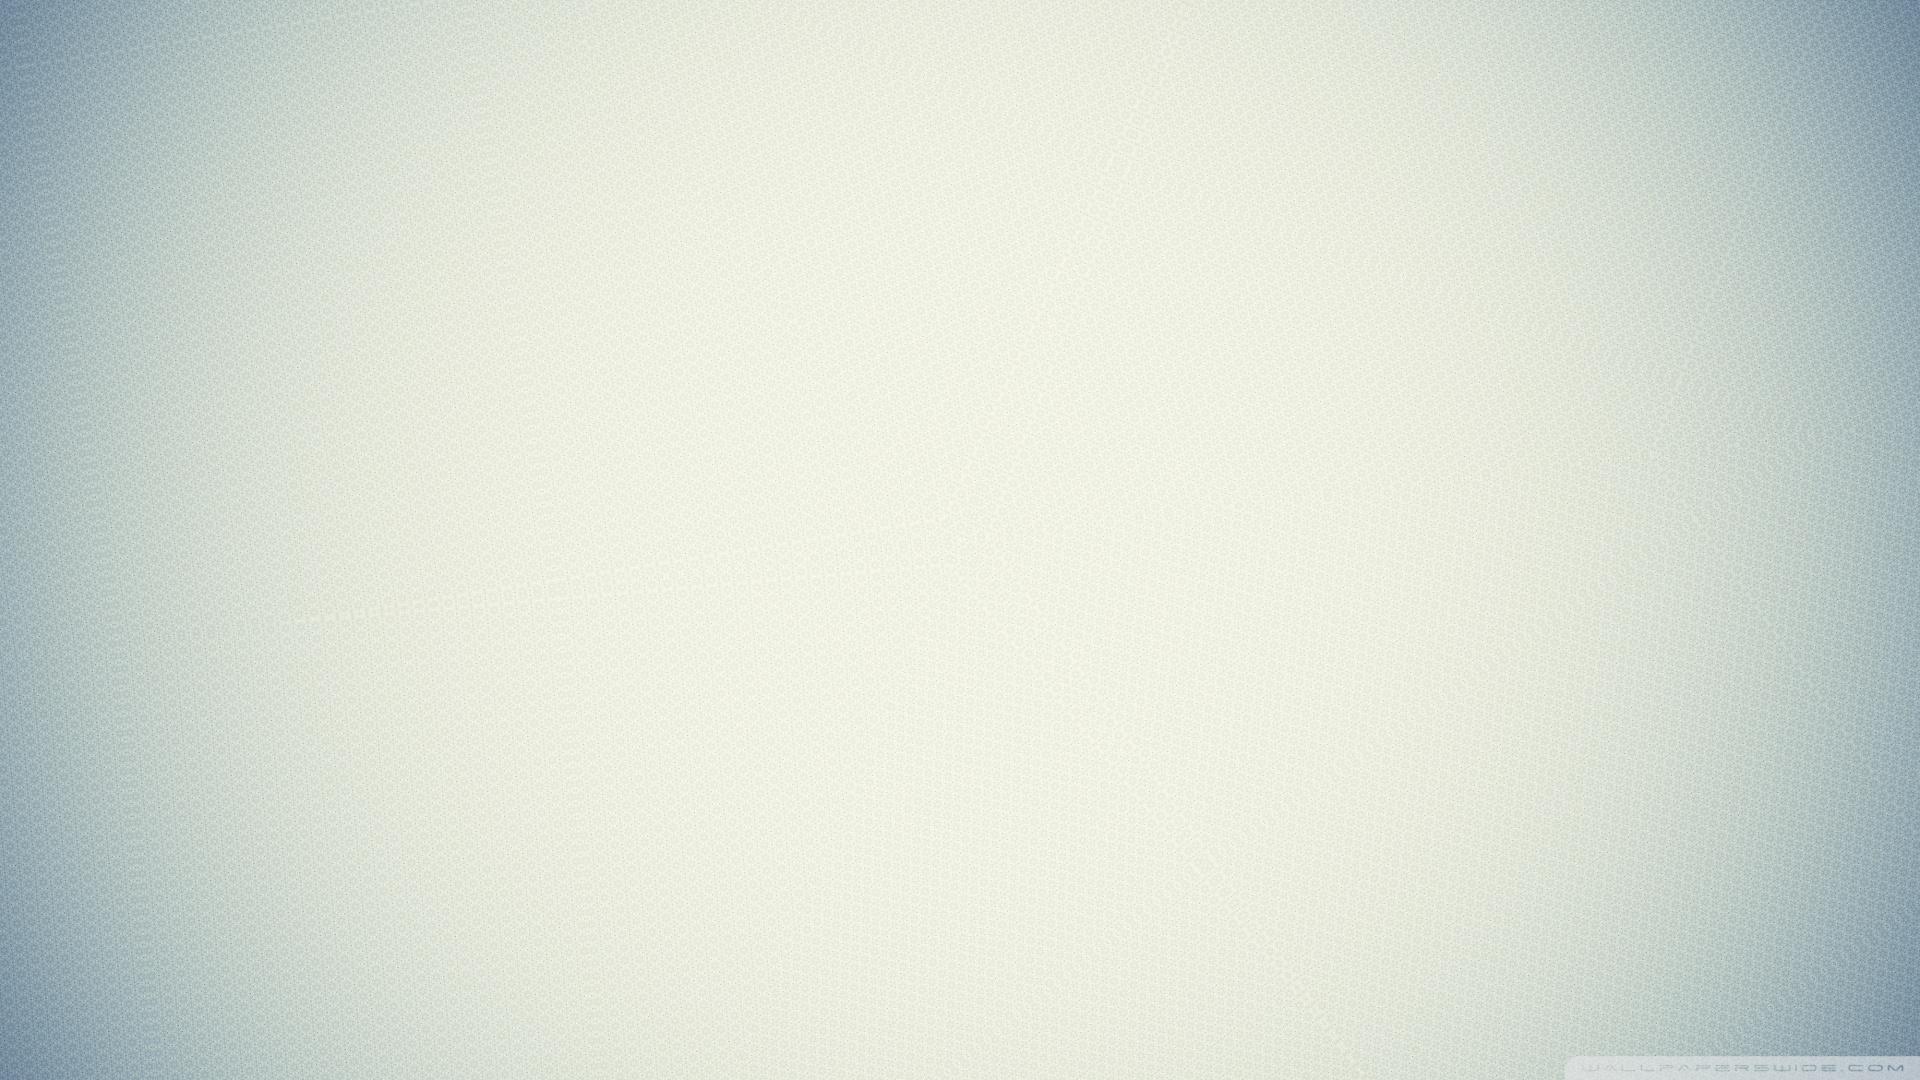 light gray background - photo #30